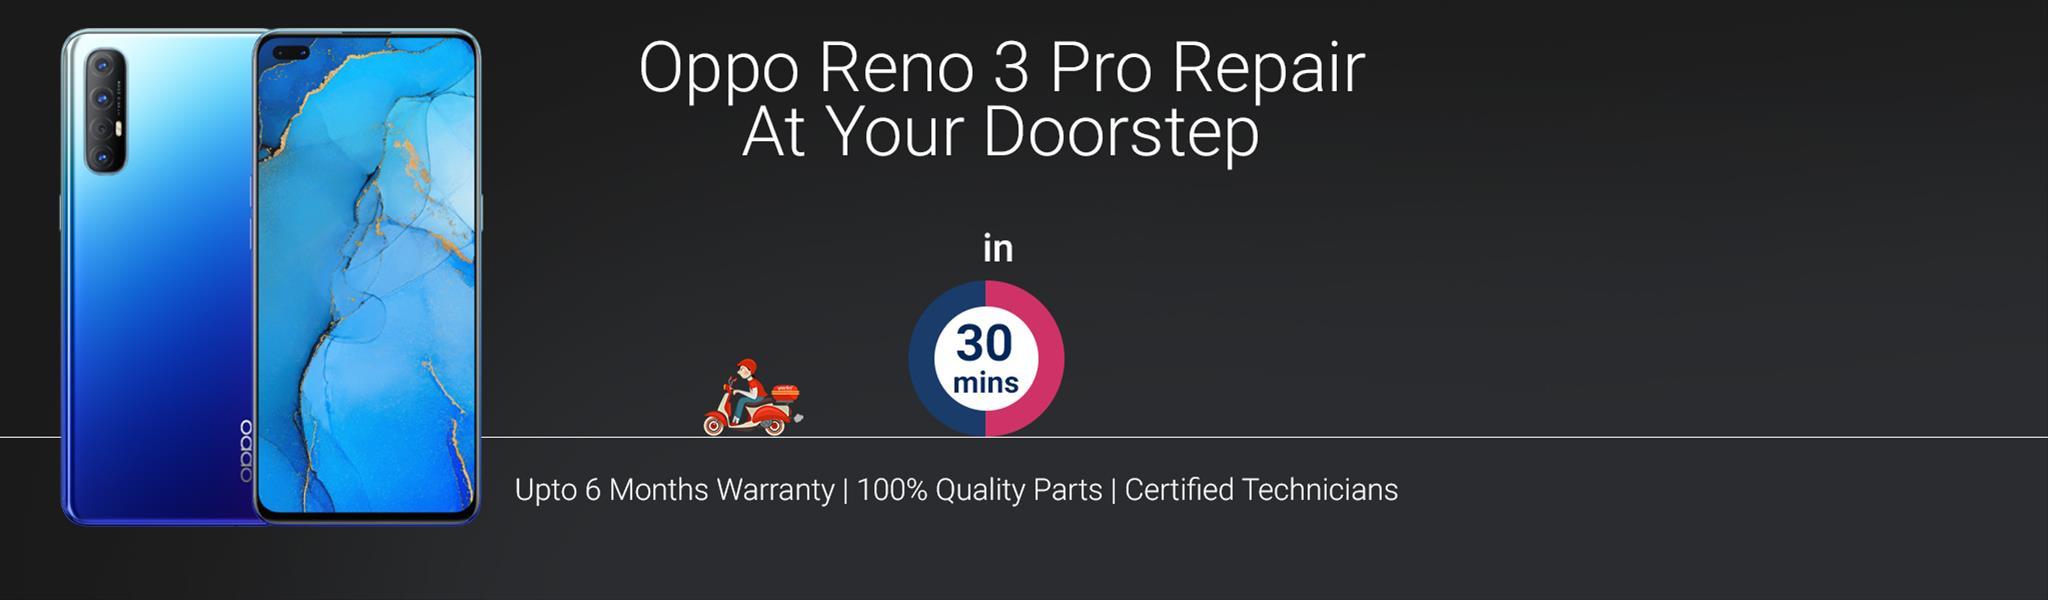 oppo-reno-3-pro-repair.jpg